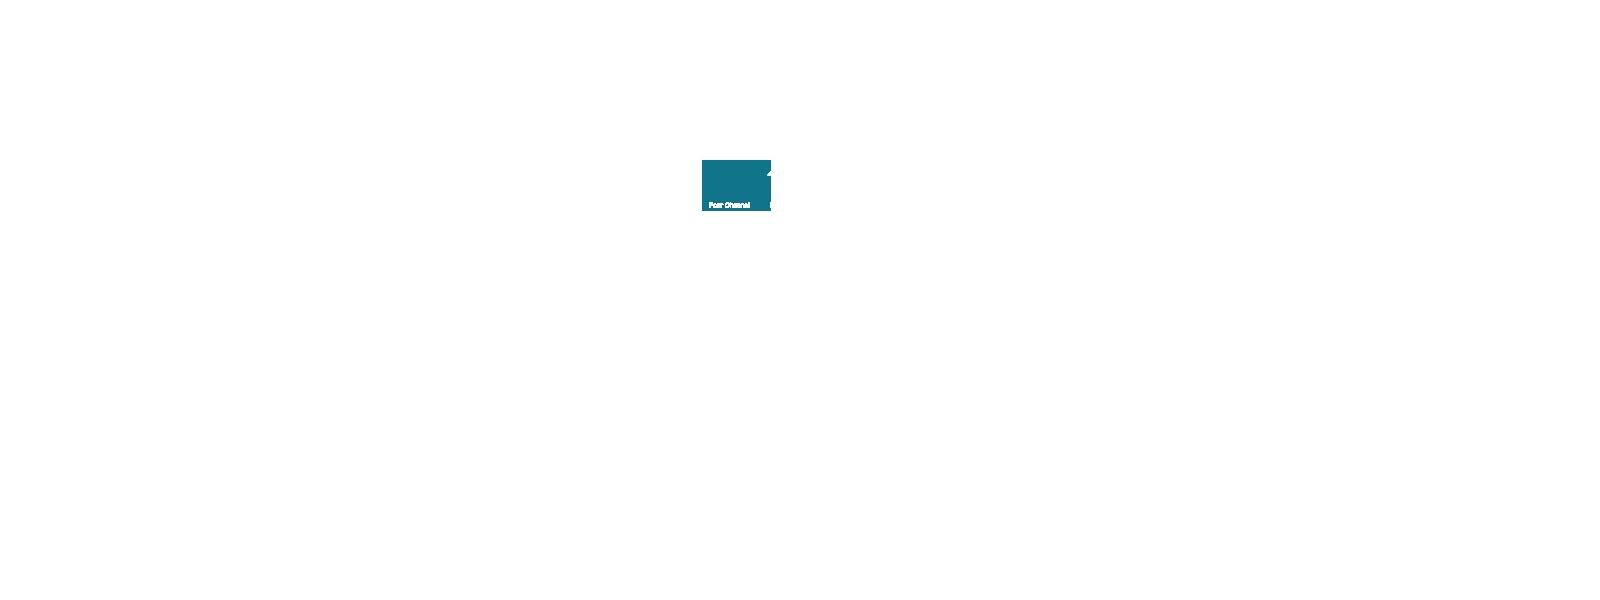 لایه ششم اسلایدر شبکه چهار ، هویت بصری ، هویت بصری شبکه چهار سیما ، شرکت تبلیغاتی الف ، طراحی هویت بصری